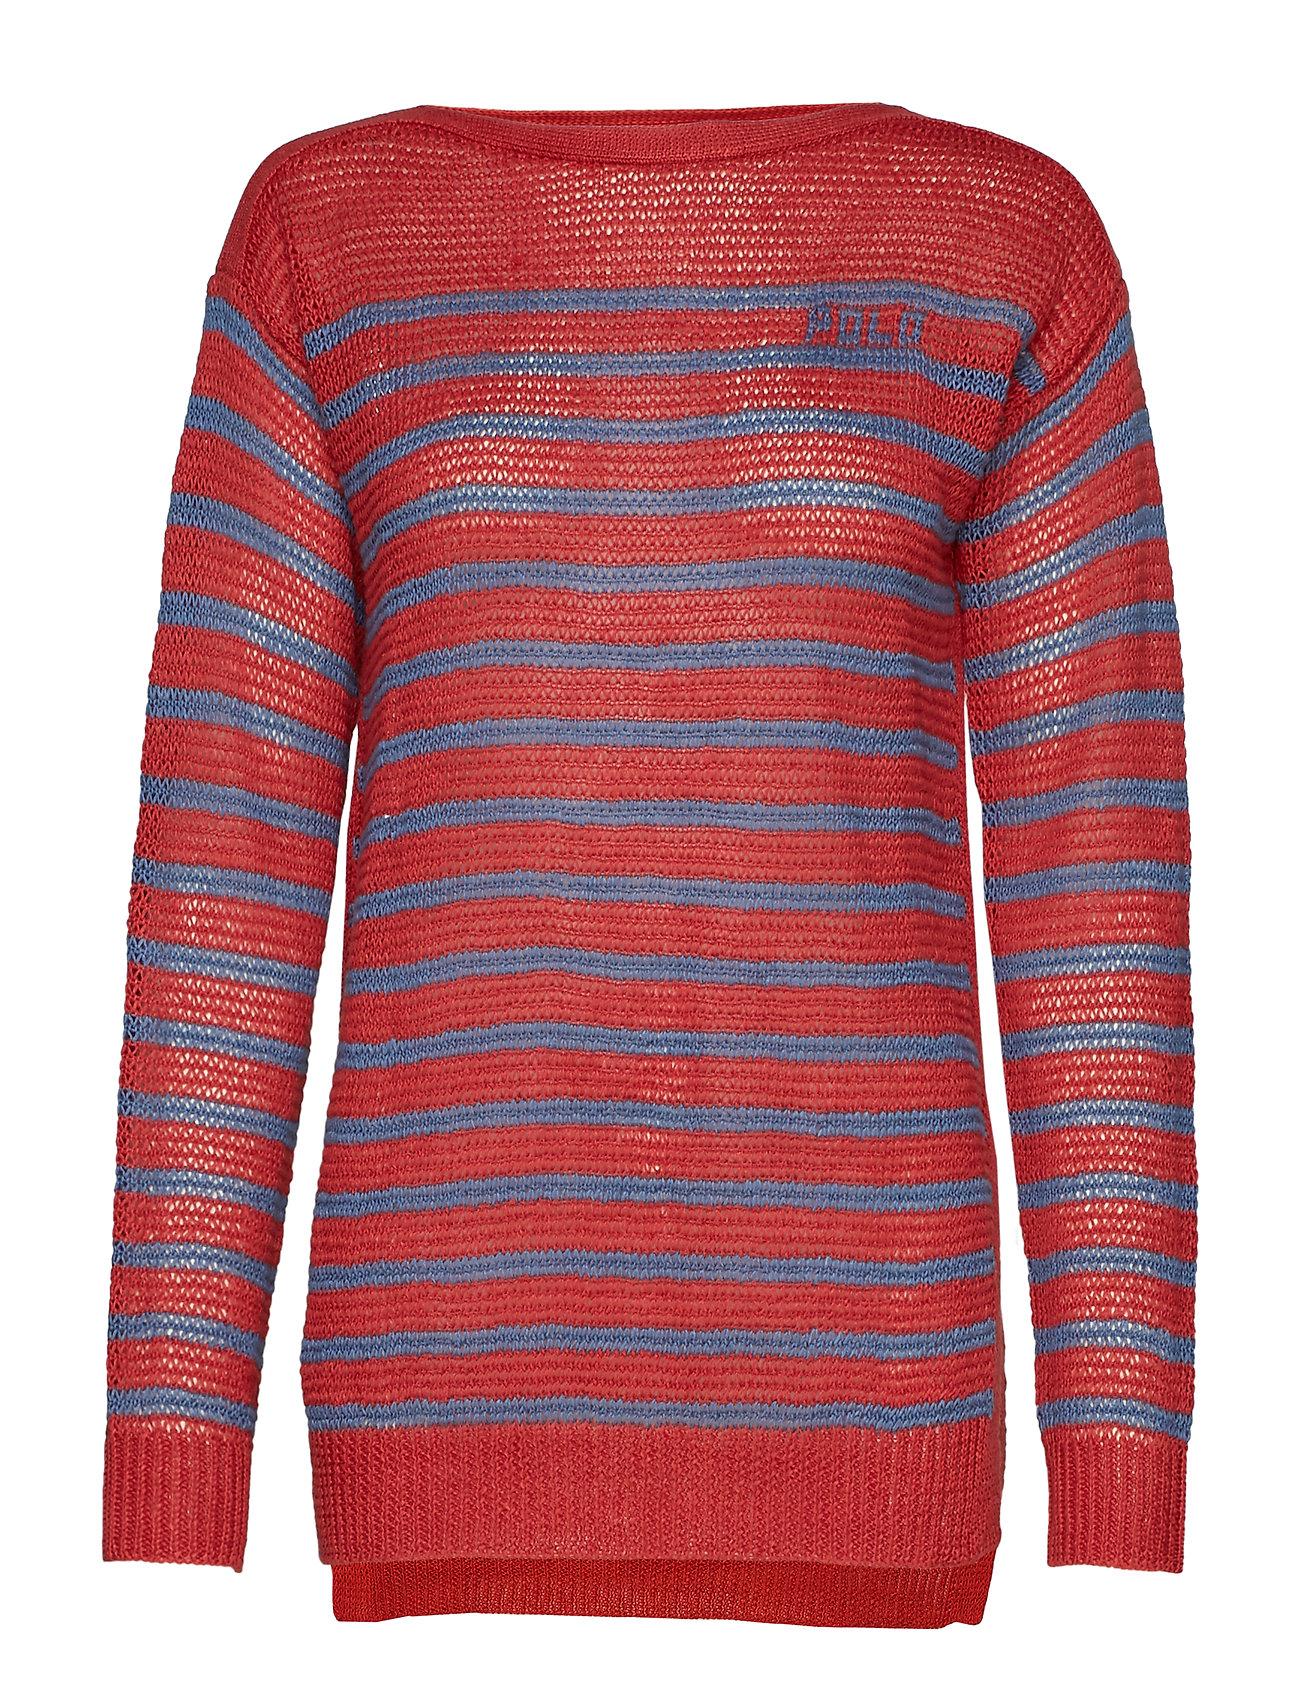 Polo Ralph Lauren Polo Striped Linen Sweater - ADIRONDACK BERRY/